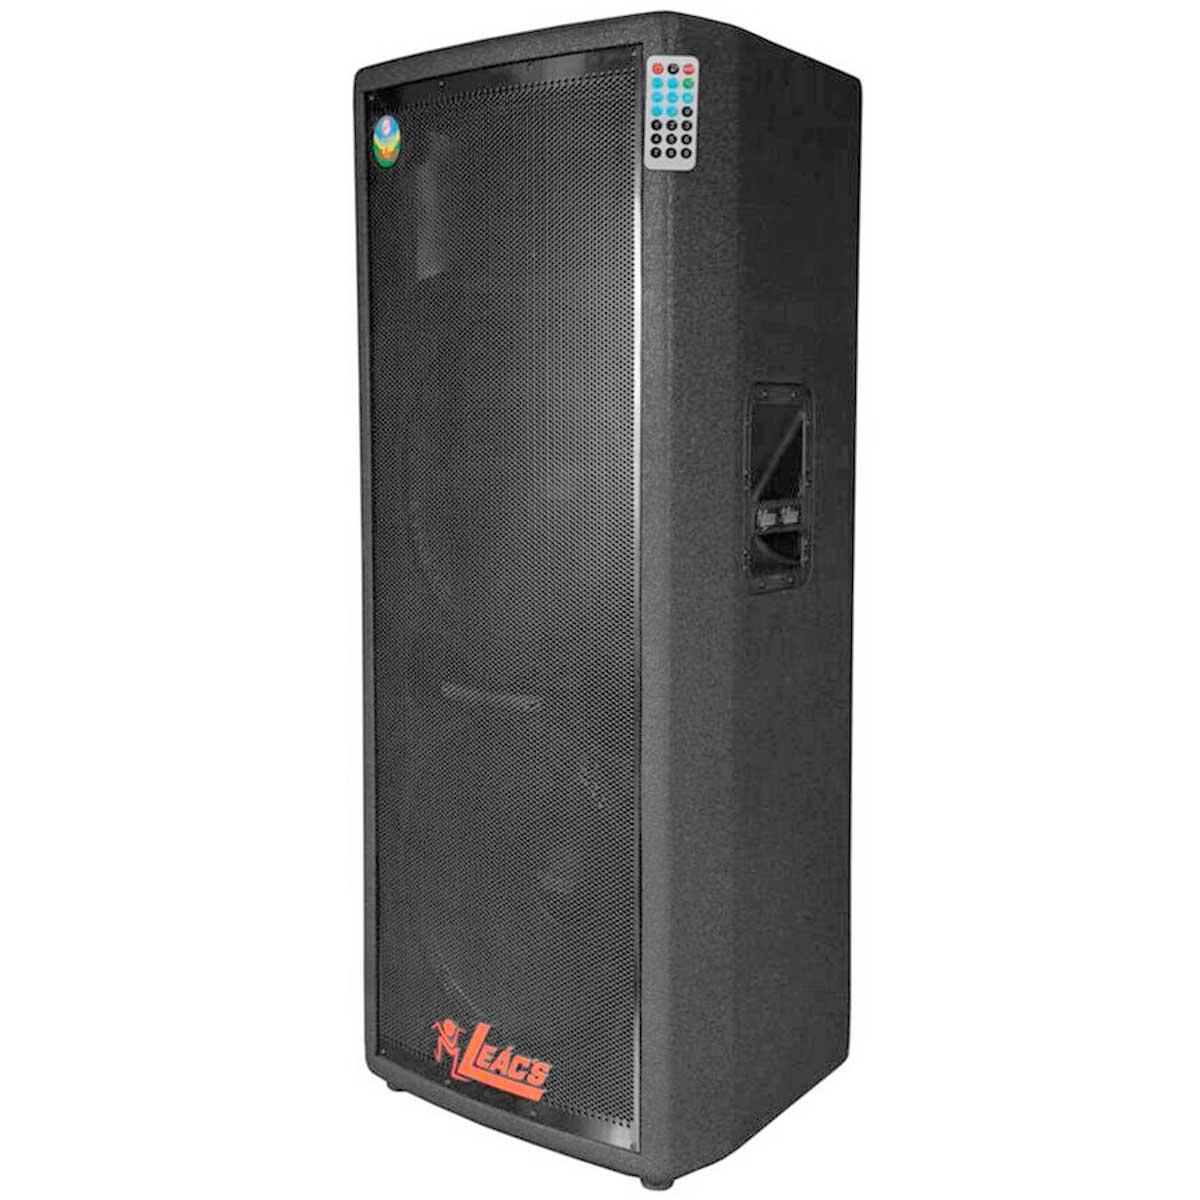 Caixa Ativa Fal 2x15 Pol 500W c/ USB - Pulps 950 A Leacs